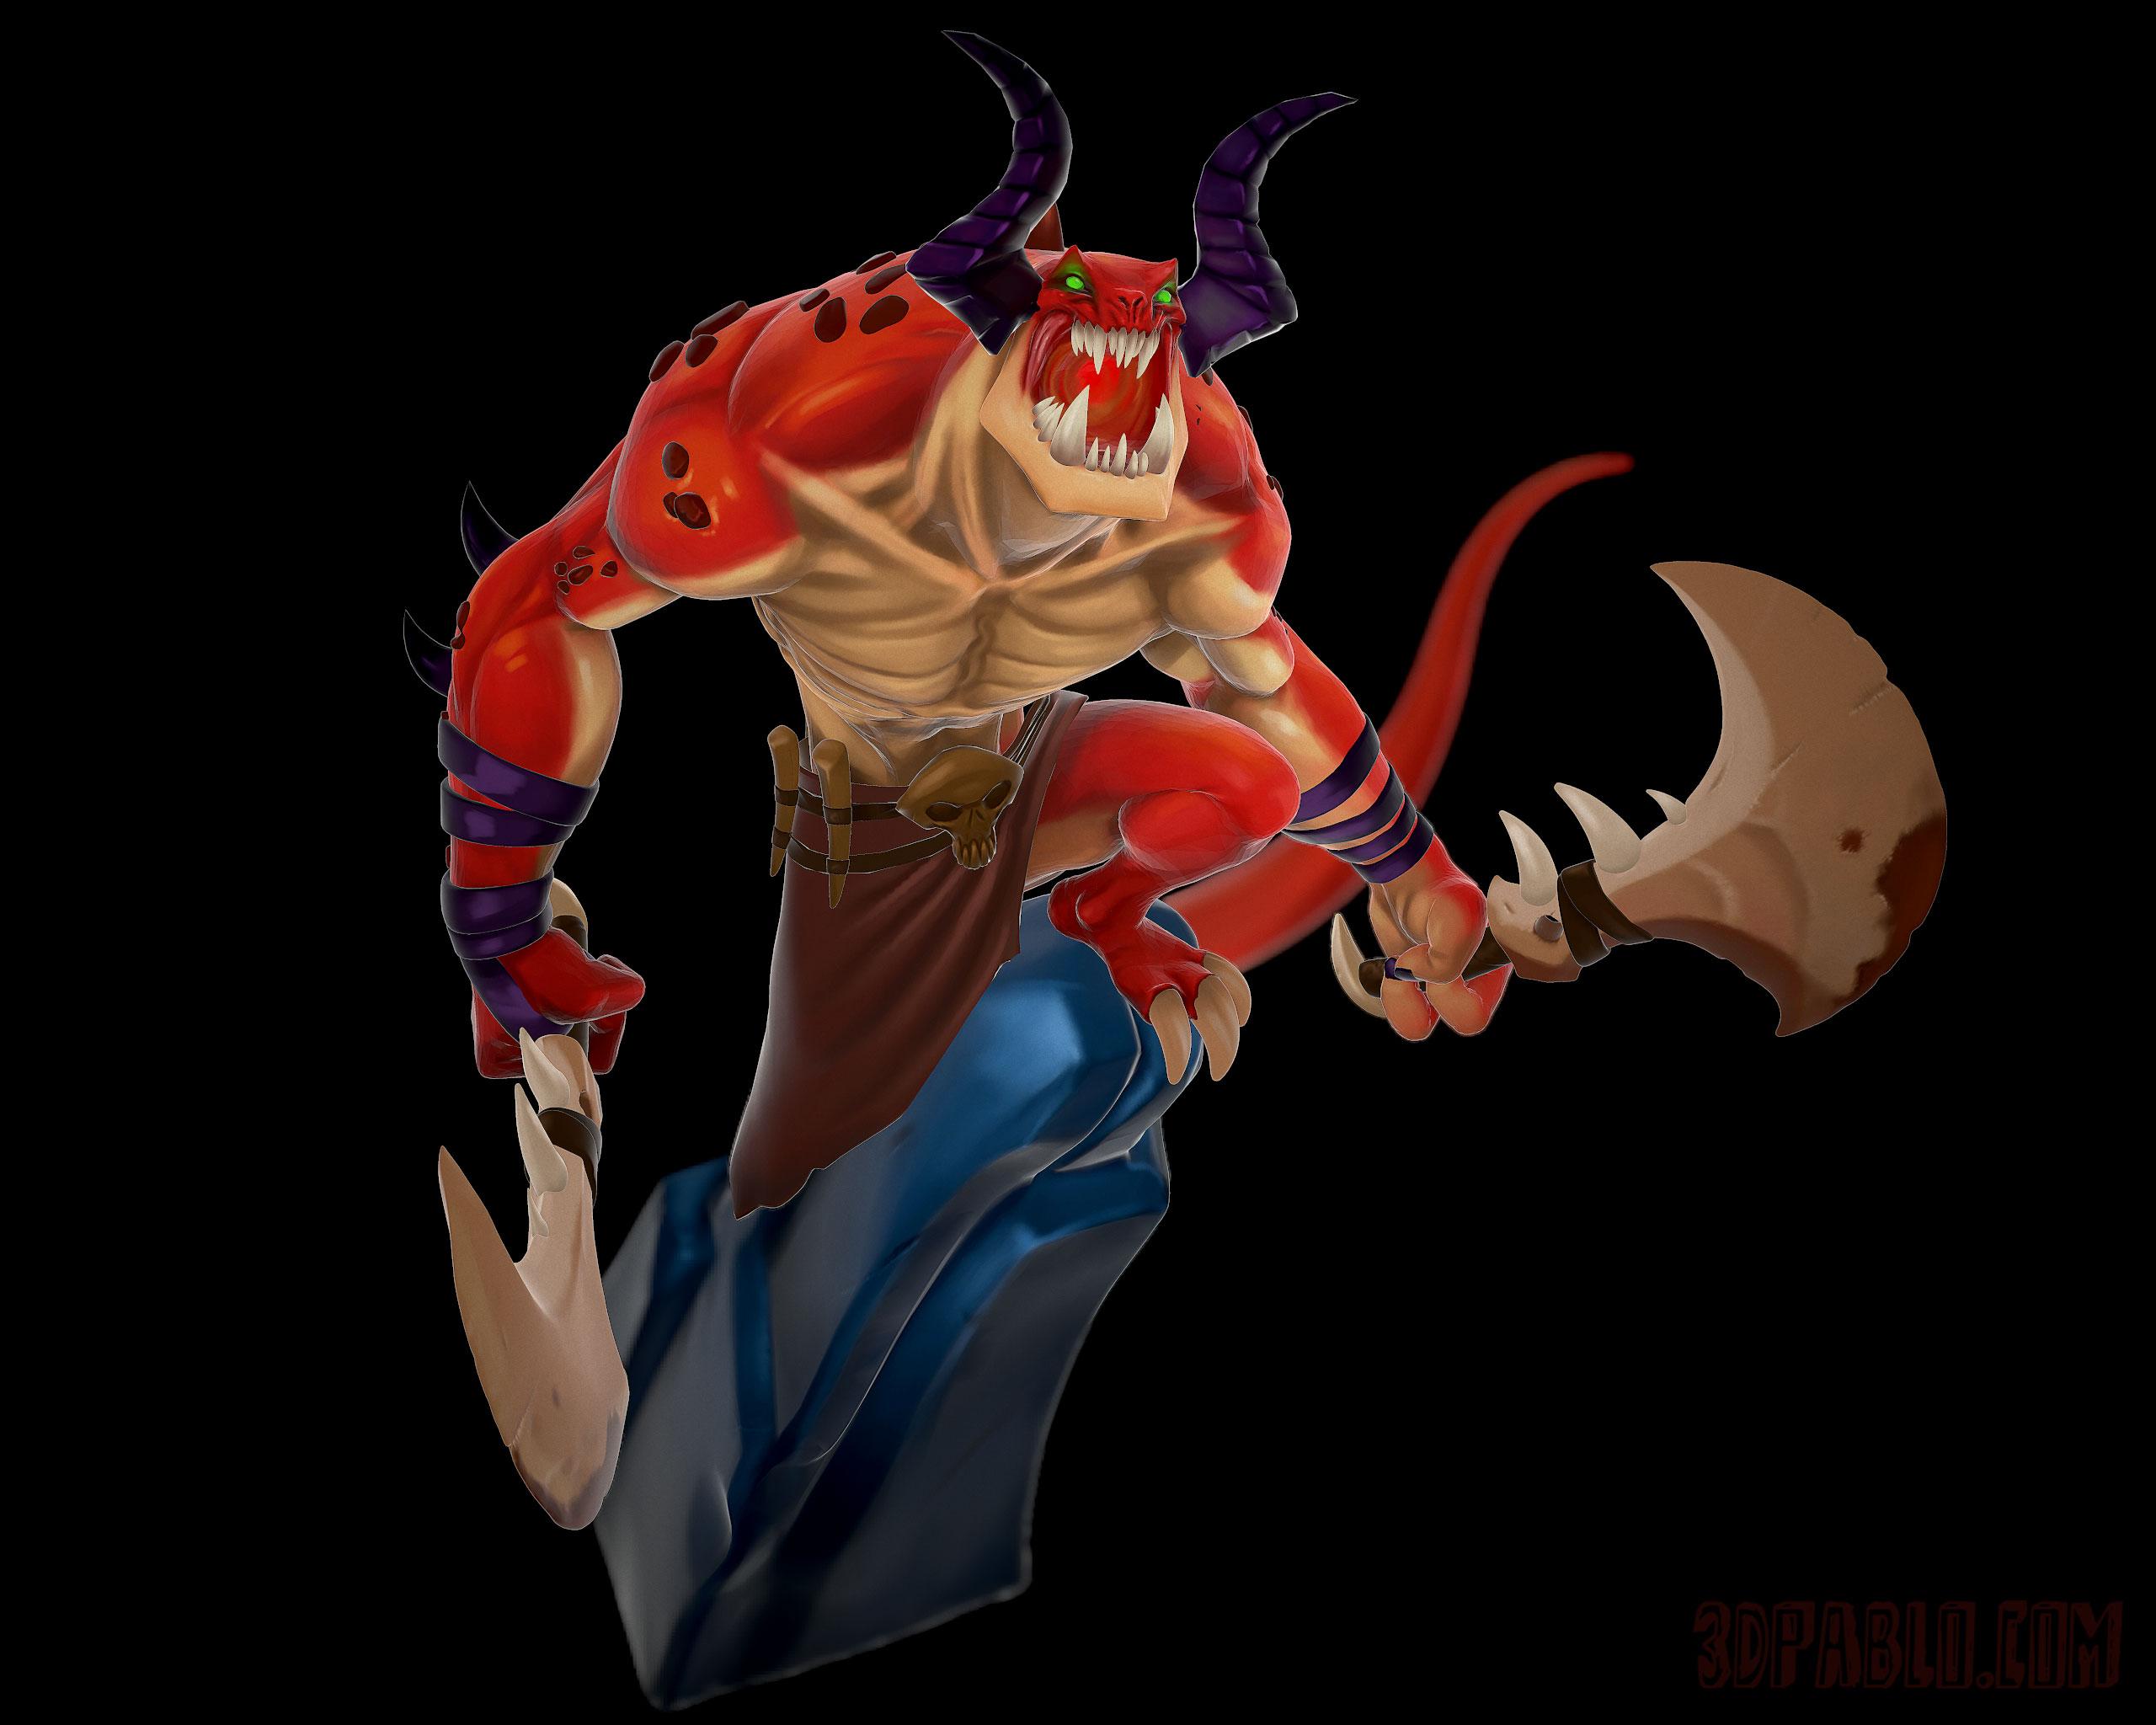 dragon_3d_by_pabgo-d998dit.jpg